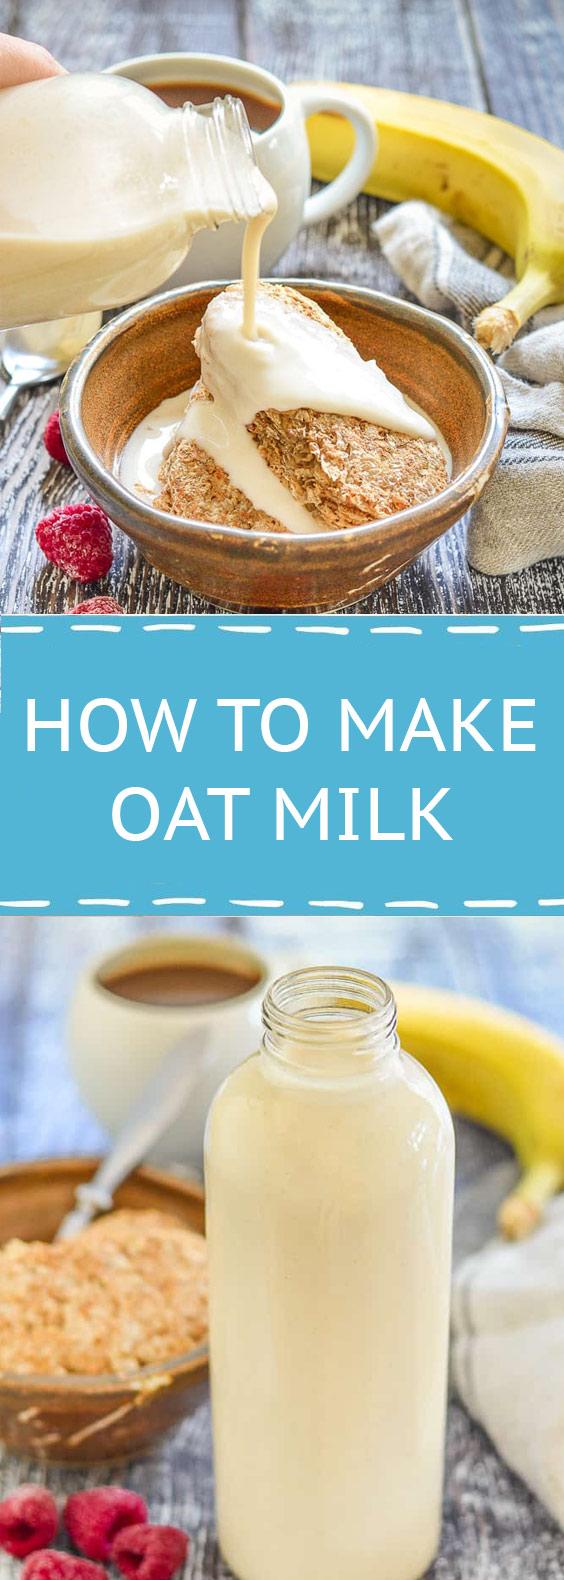 How to Make Oatmeals